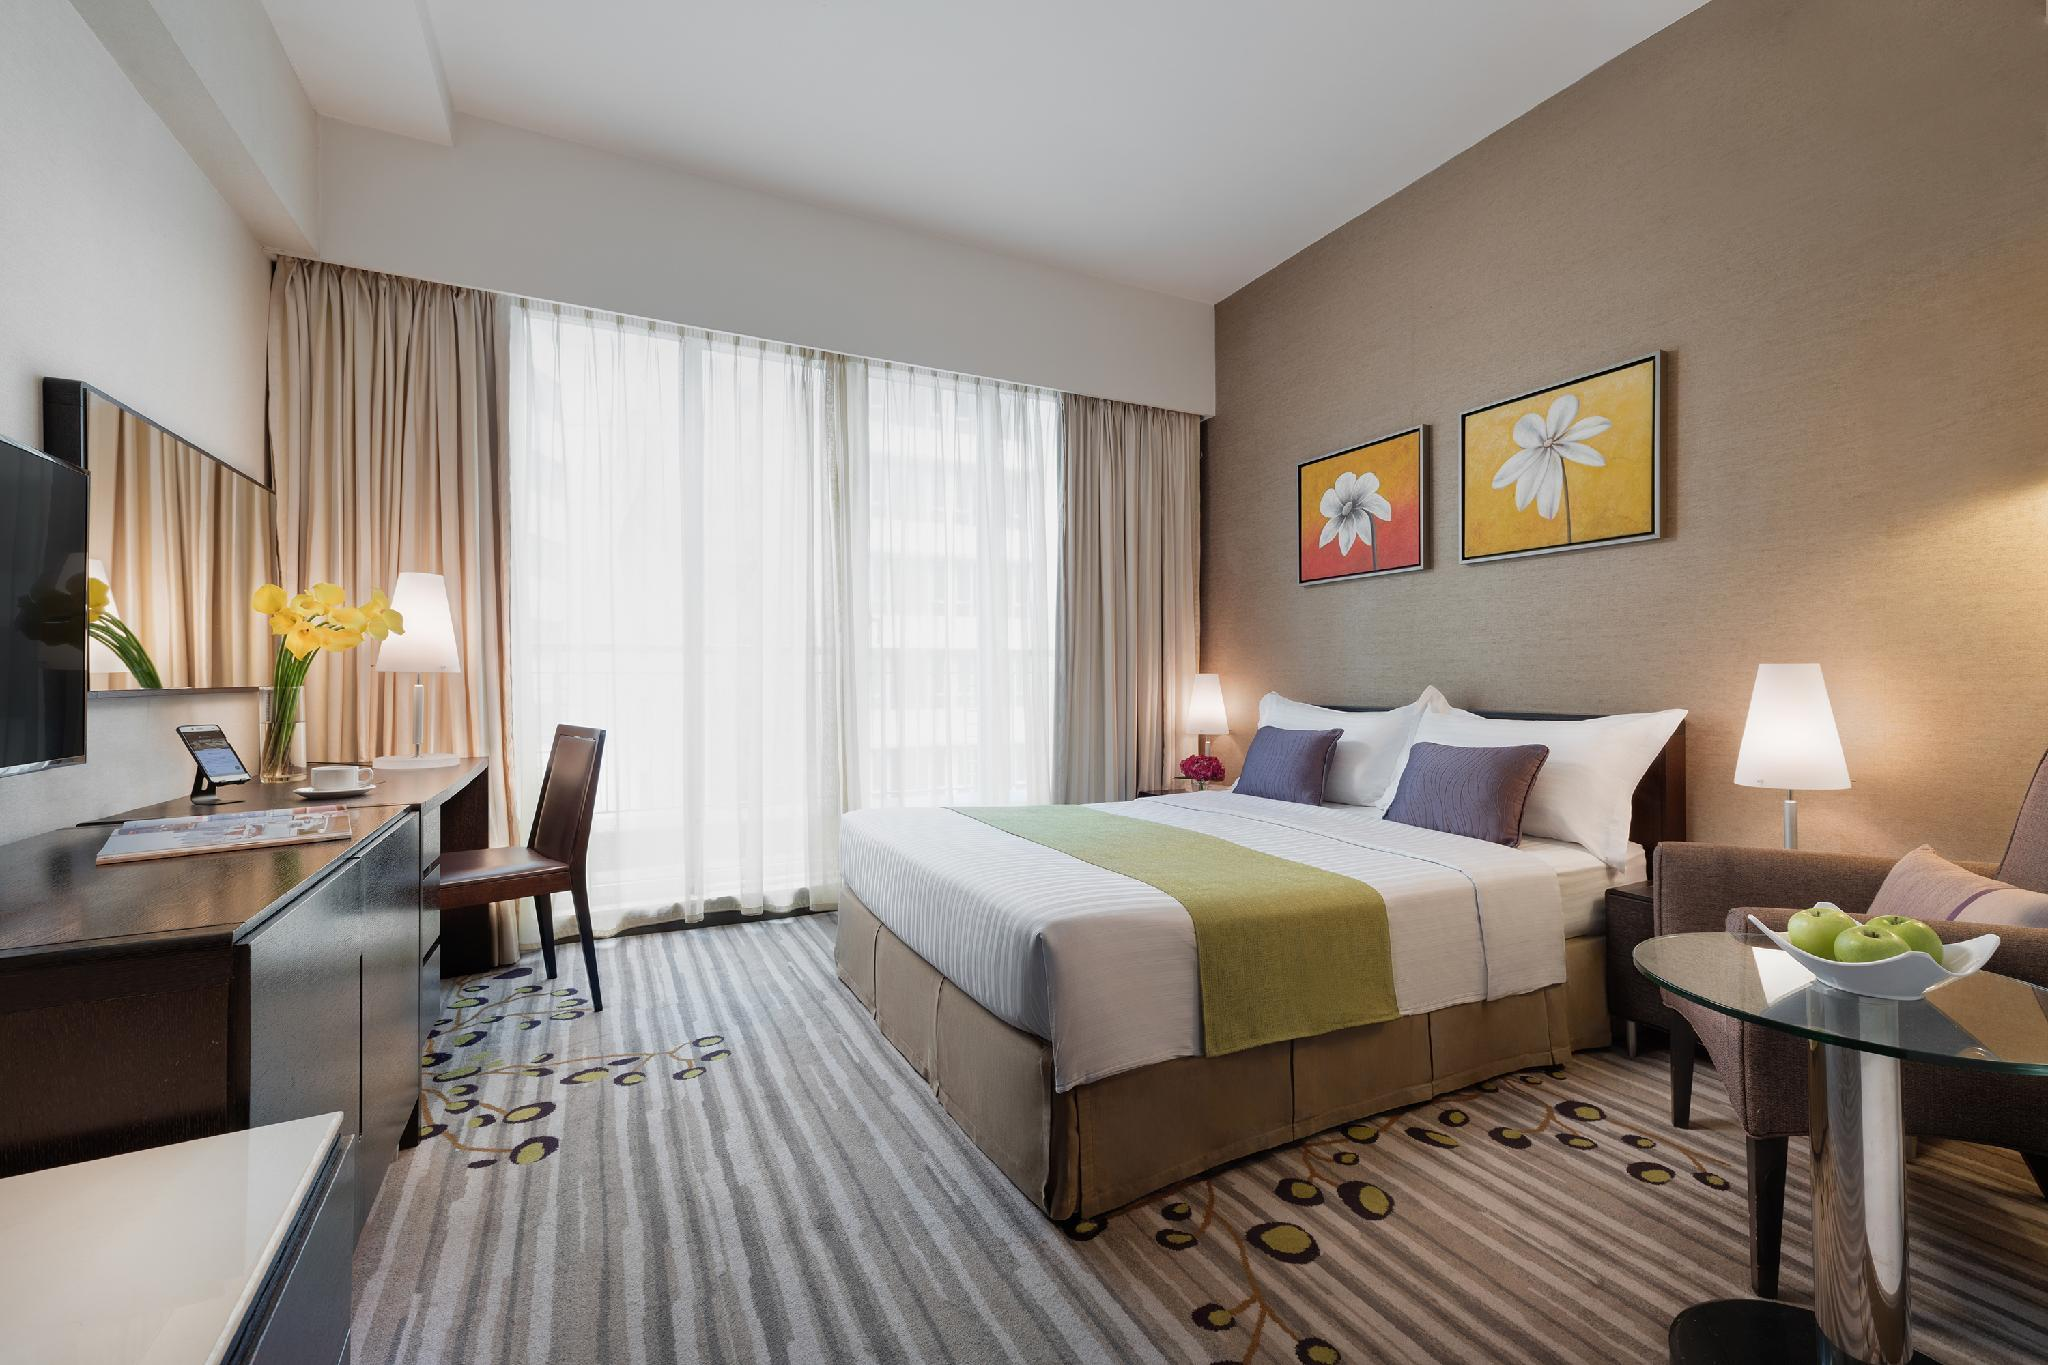 香港香港百樂酒店 (Park Hotel Hong Kong)線上訂房|Agoda.com